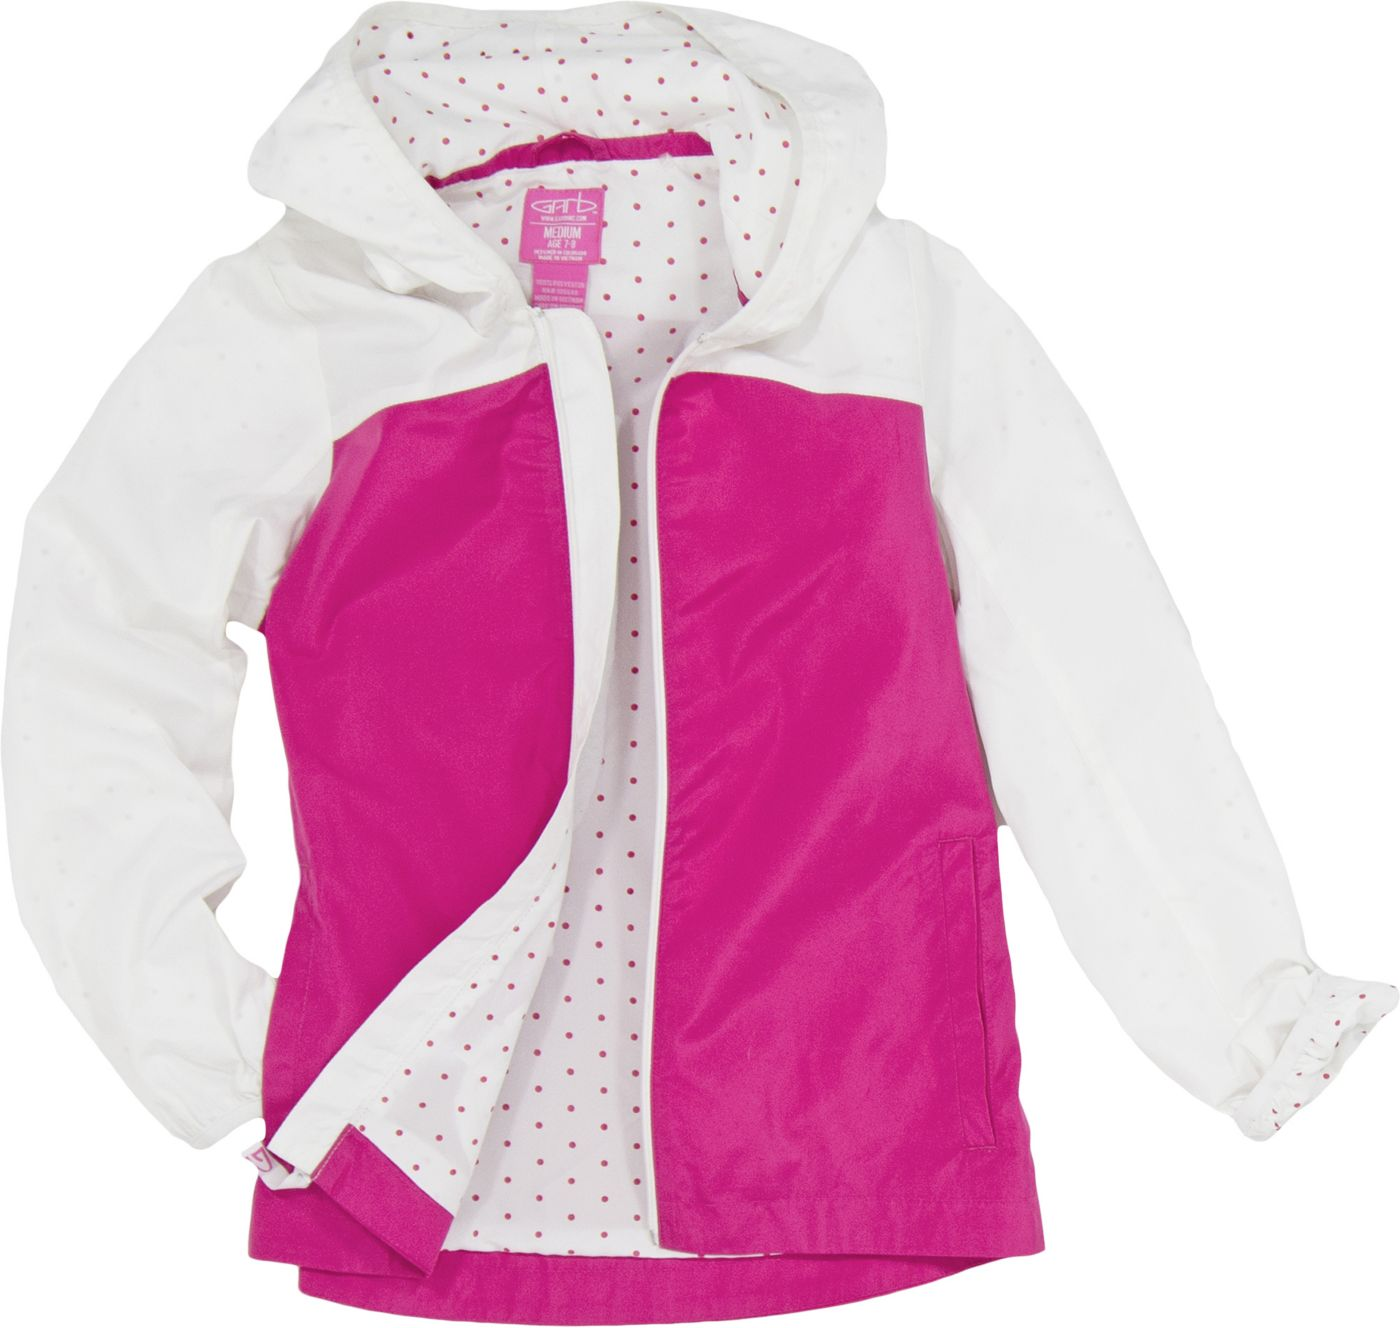 Garb Girls' Brooklyn Full-Zip Golf Jacket